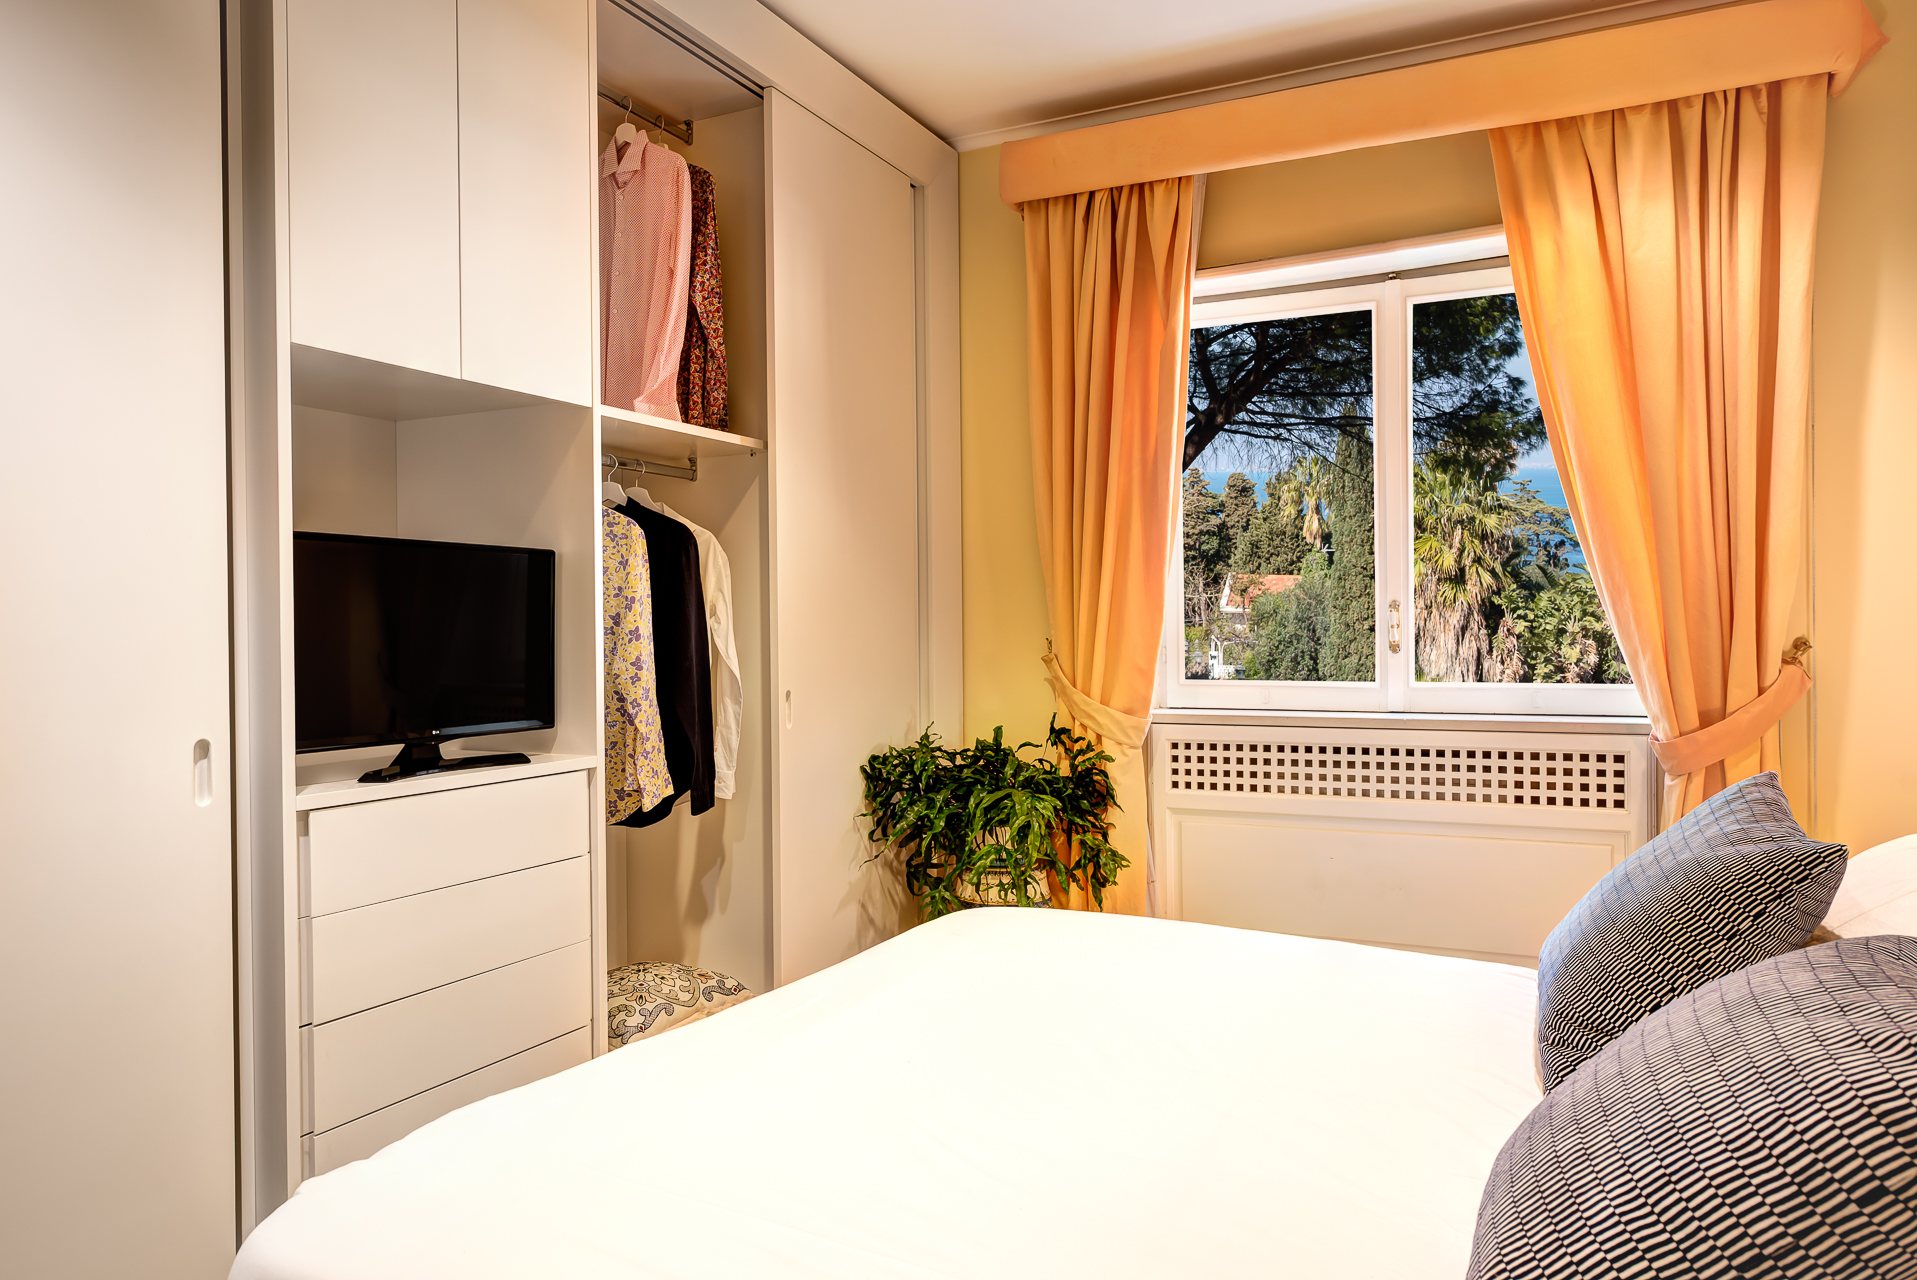 El Royale Suites Sorrento - Gold photo 20280705